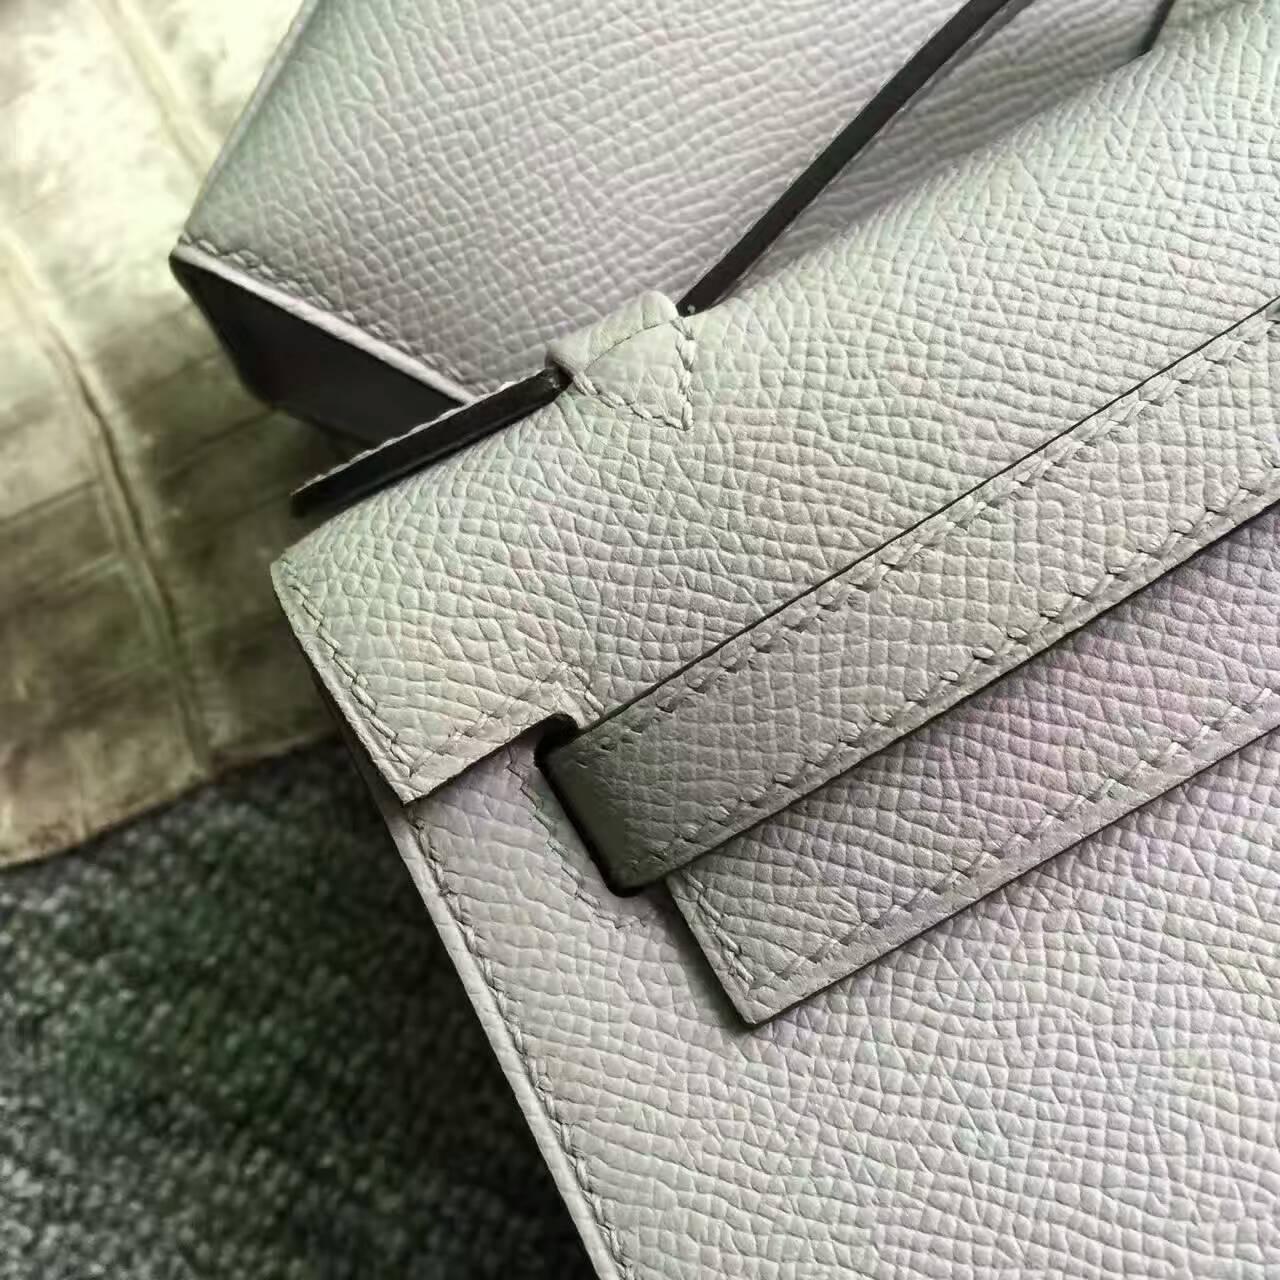 Discount Hermes 8U Blue Glacier Epsom Calfskin Leather Minikelly Clutch Bag 22CM